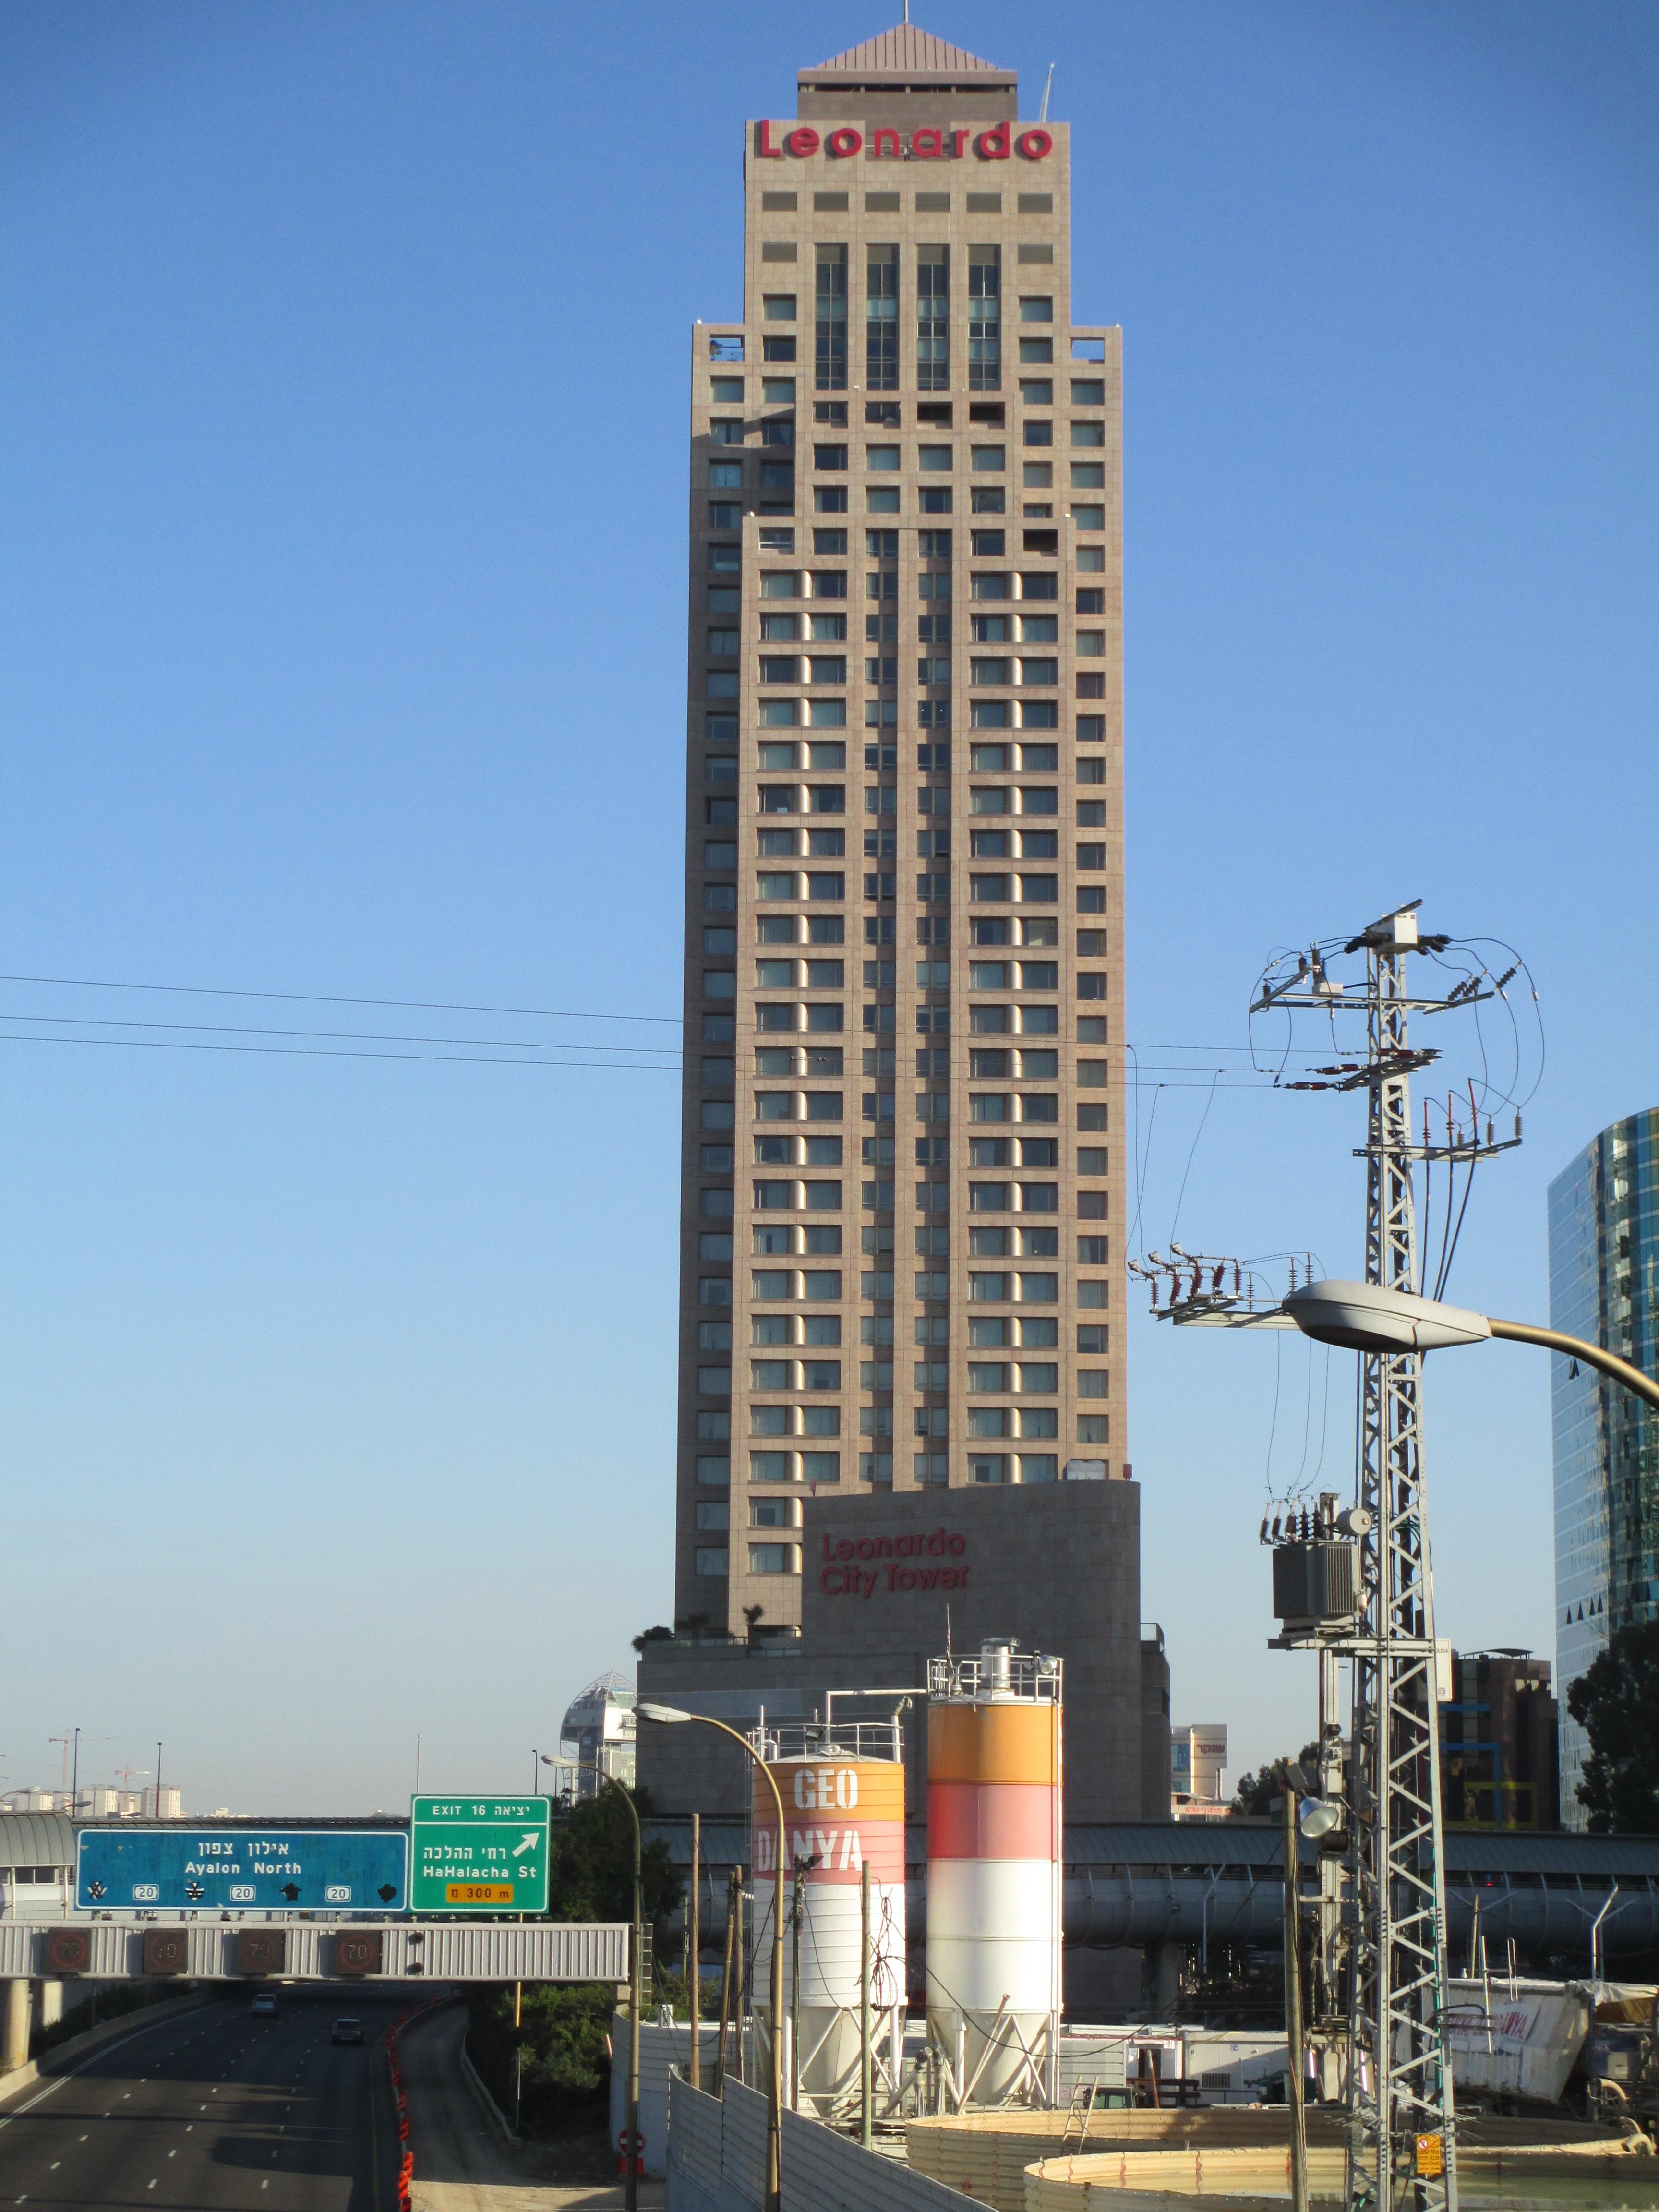 File:PikiWiki Israel 34356 Leonardo city tower in Ramat Gan.JPG - Wikimedia  Commons